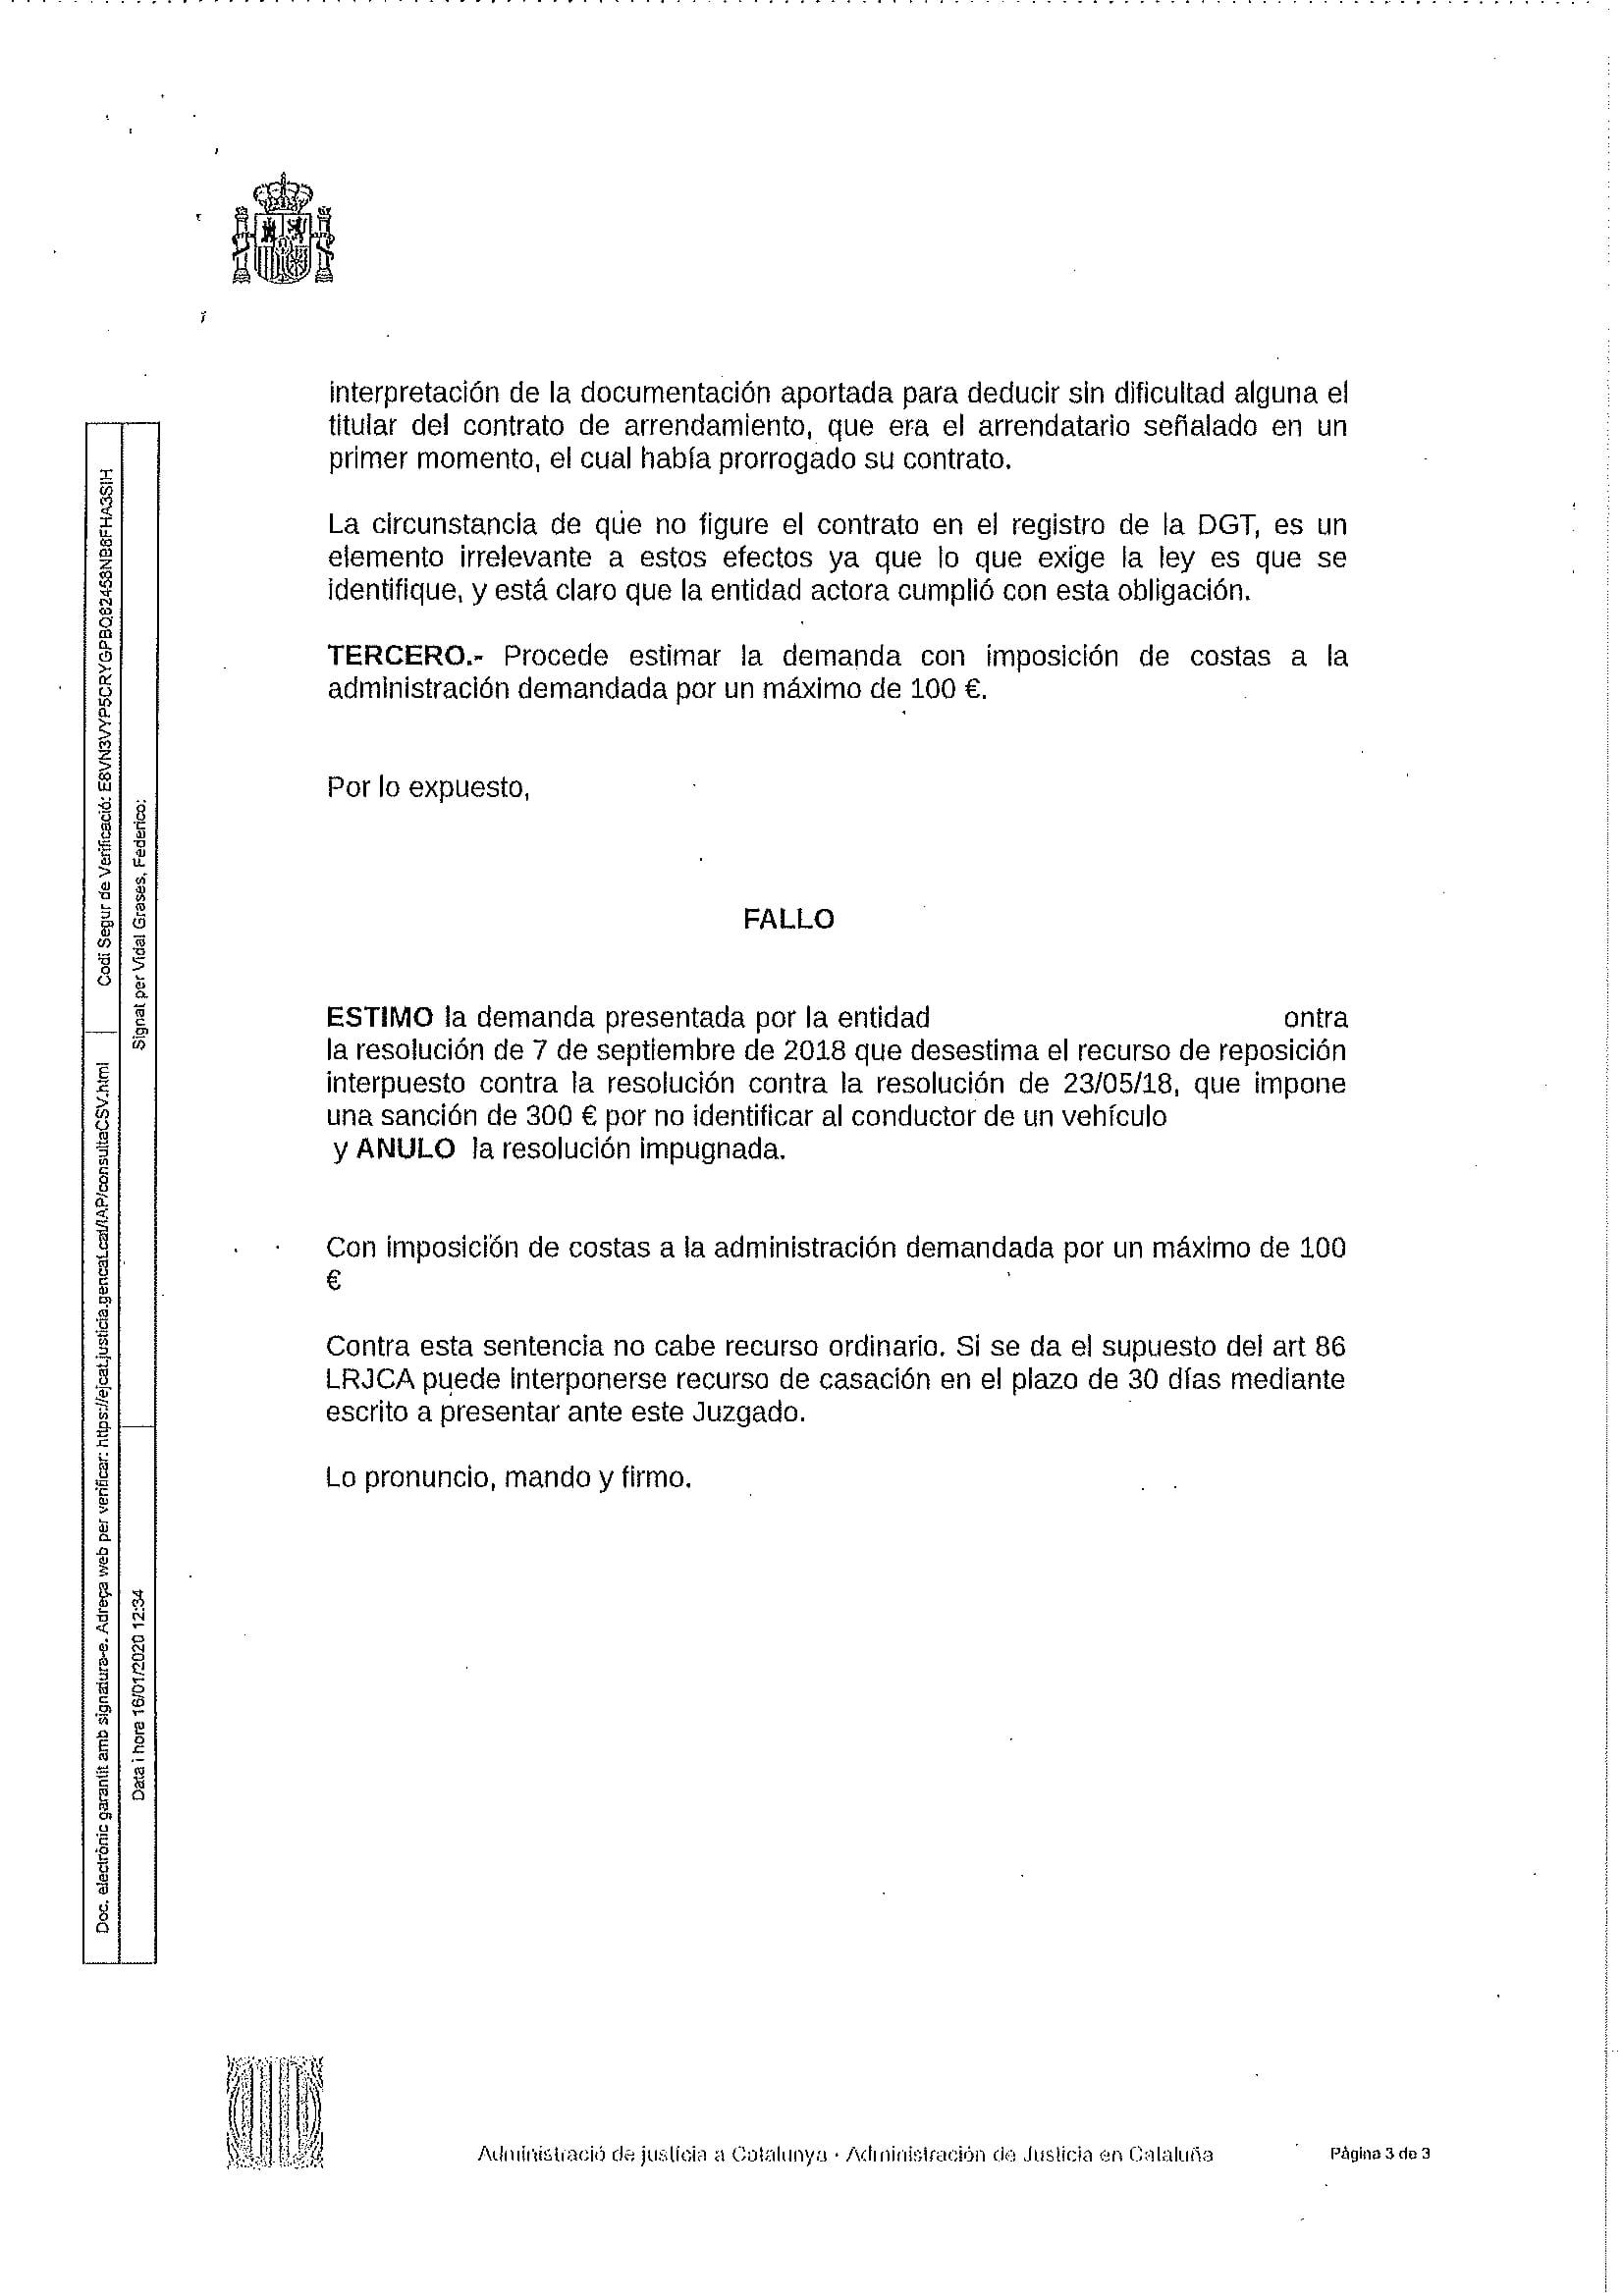 INCUMPLIMIENTO-3